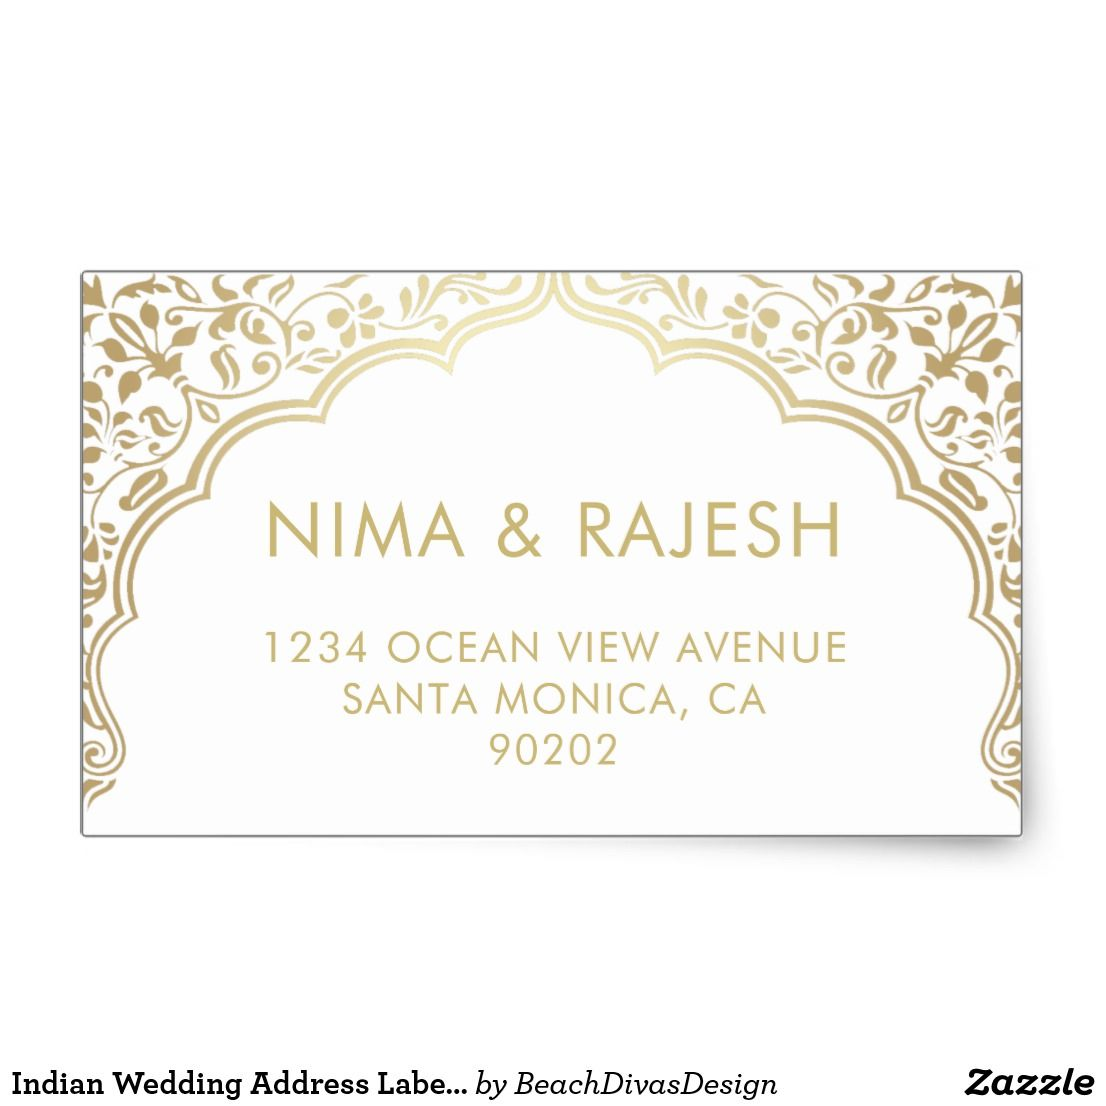 Indian Wedding Address Labels Wedding Stickers Zazzle Com In 2020 Wedding Stickers Wedding Address Labels Wedding Address